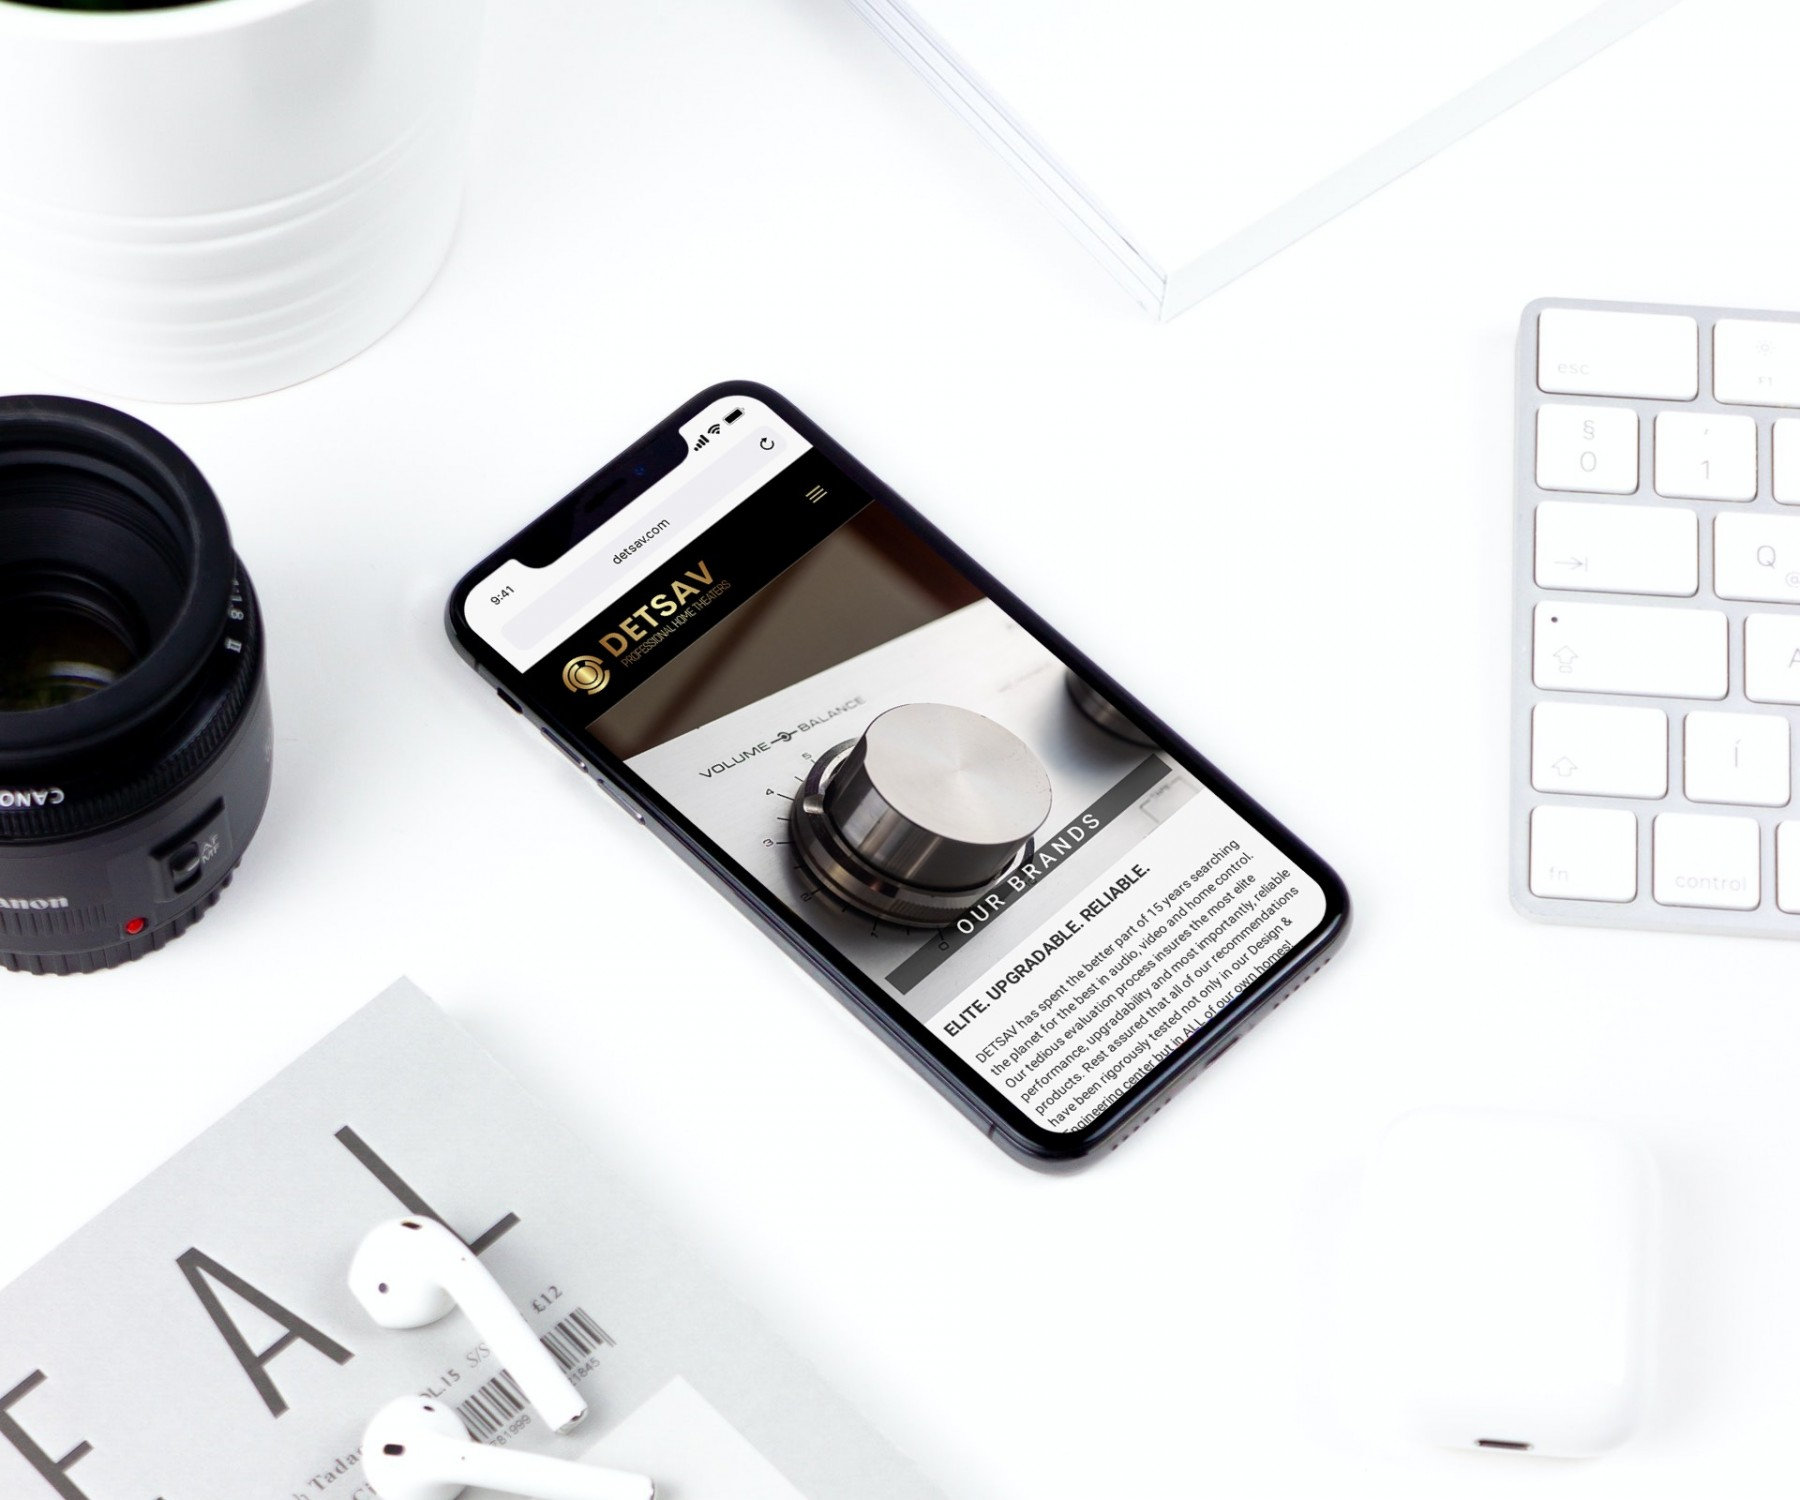 DETSAV Website Design - iPhone